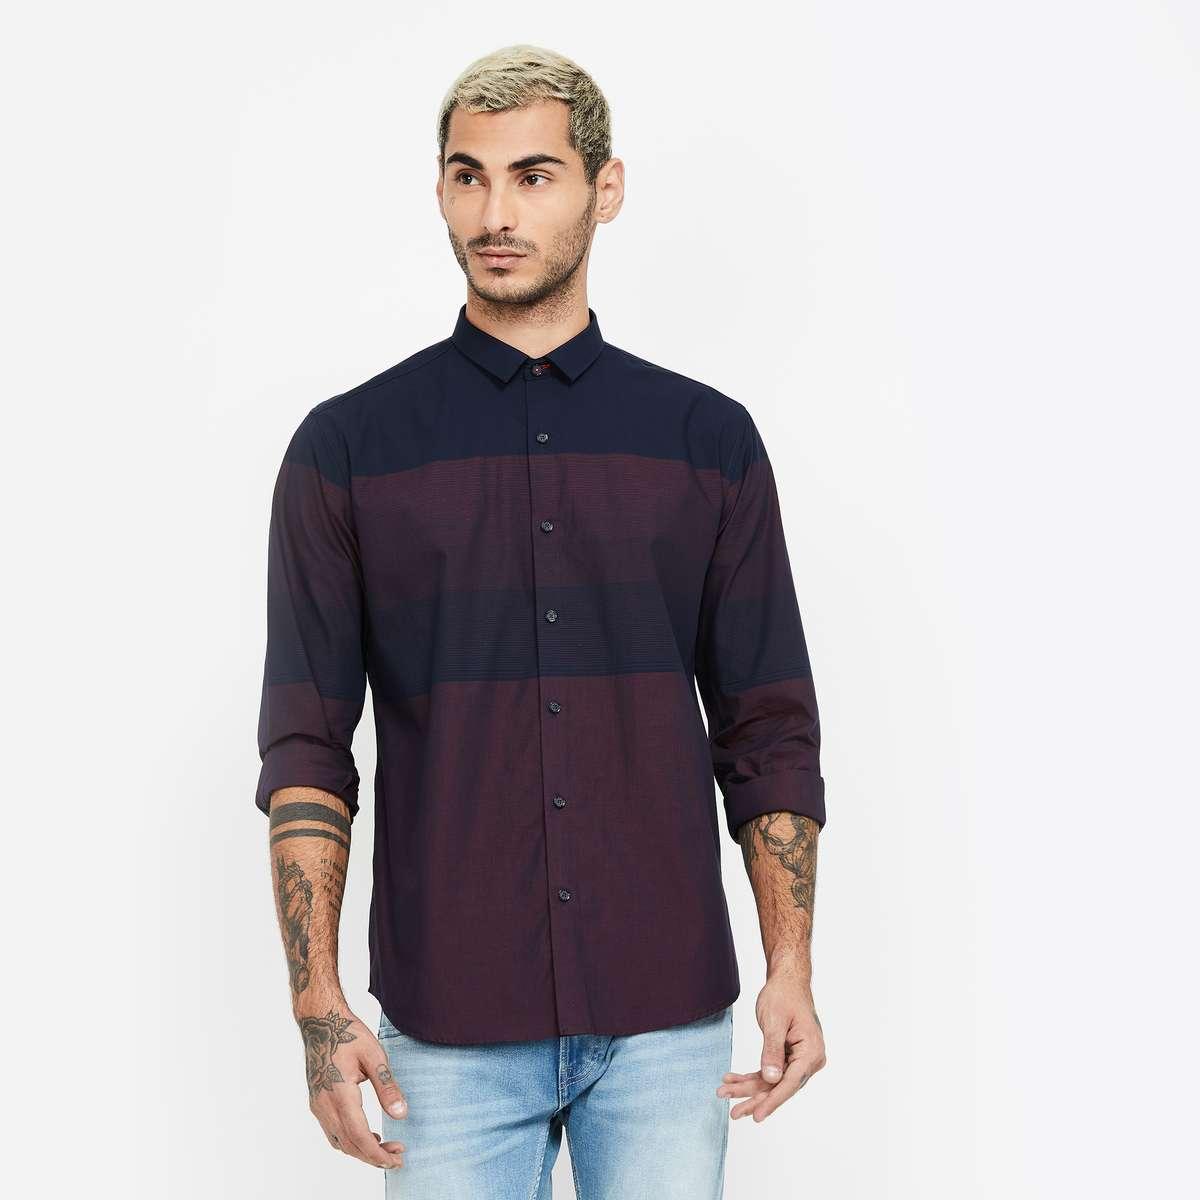 2.V DOT Colourblocked Slim Fit Casual Shirt